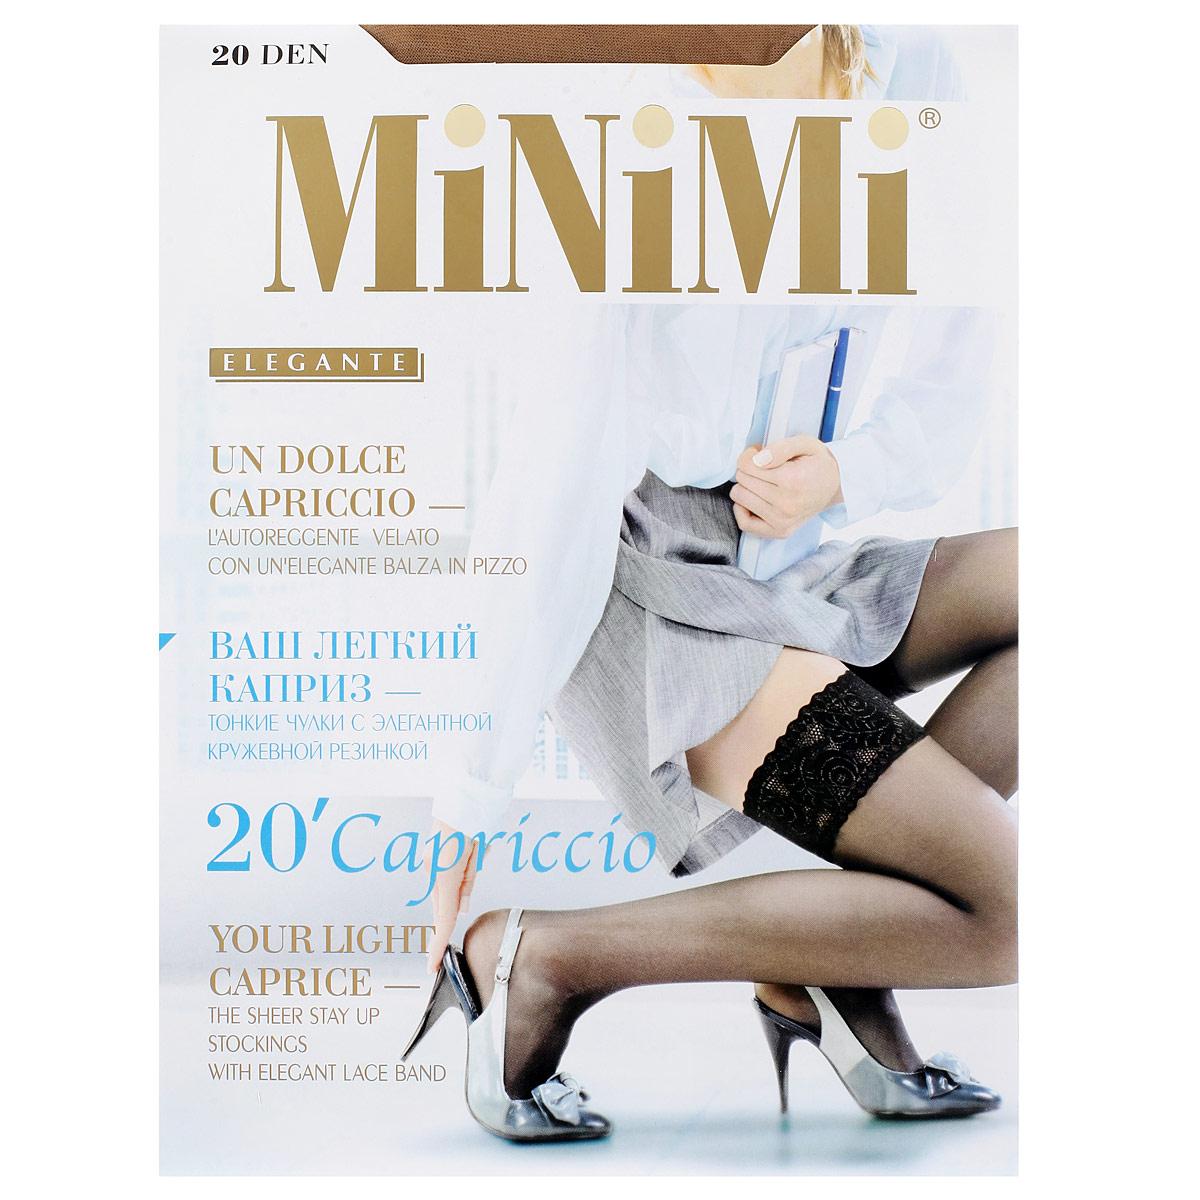 Чулки Minimi Capriccio 20, цвет: Daino (загар). Размер 4 (L/XL)